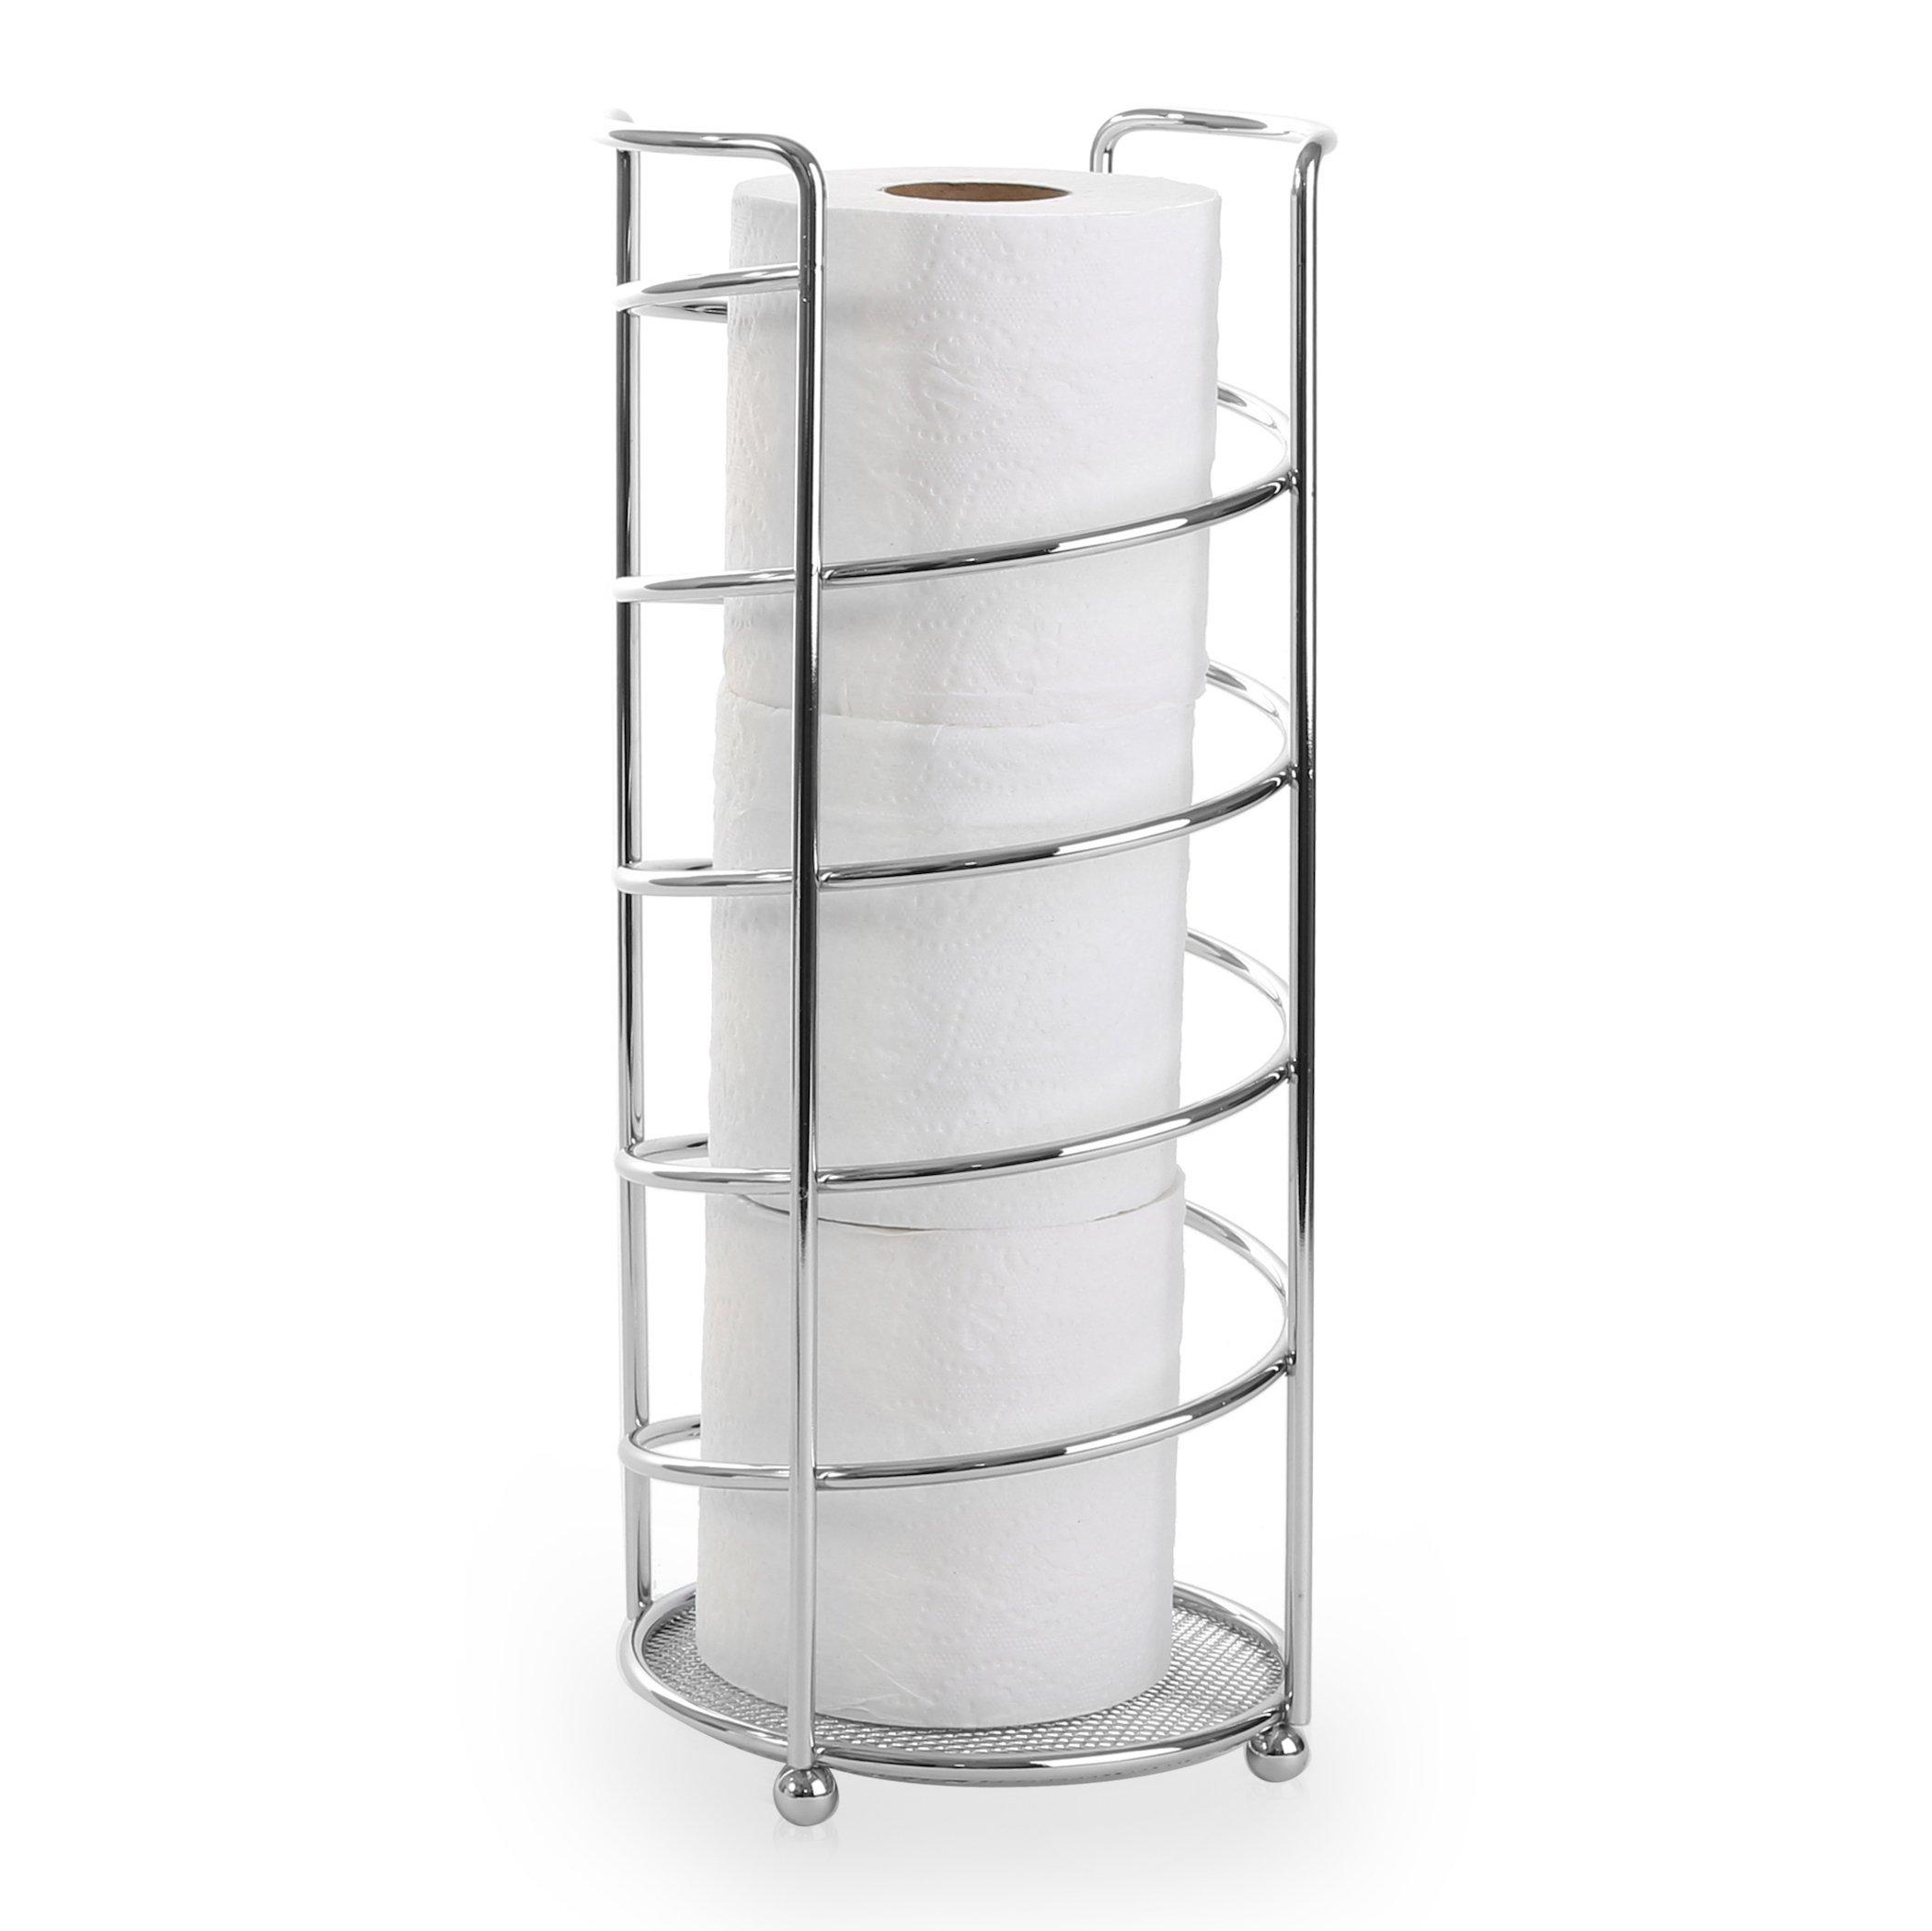 BINO 'Spiral' Toilet Paper Holder by BINO